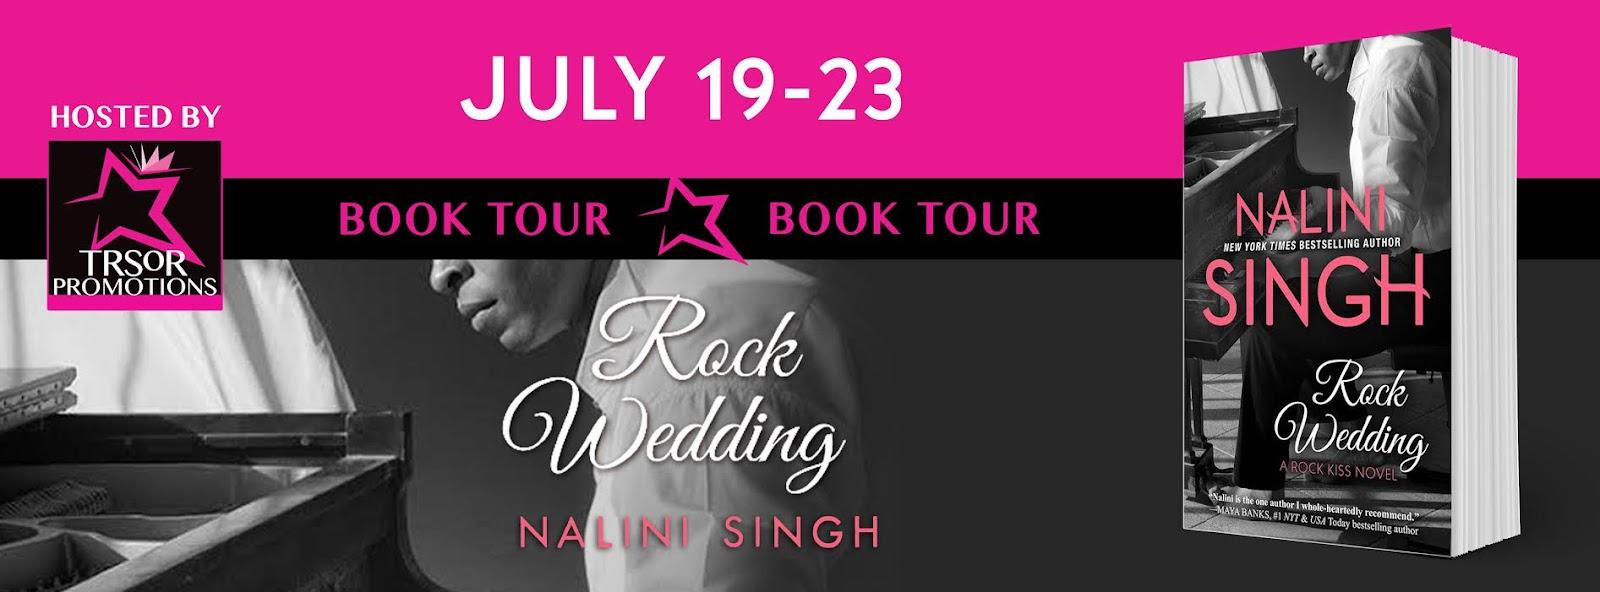 rock wedding book tour.jpg